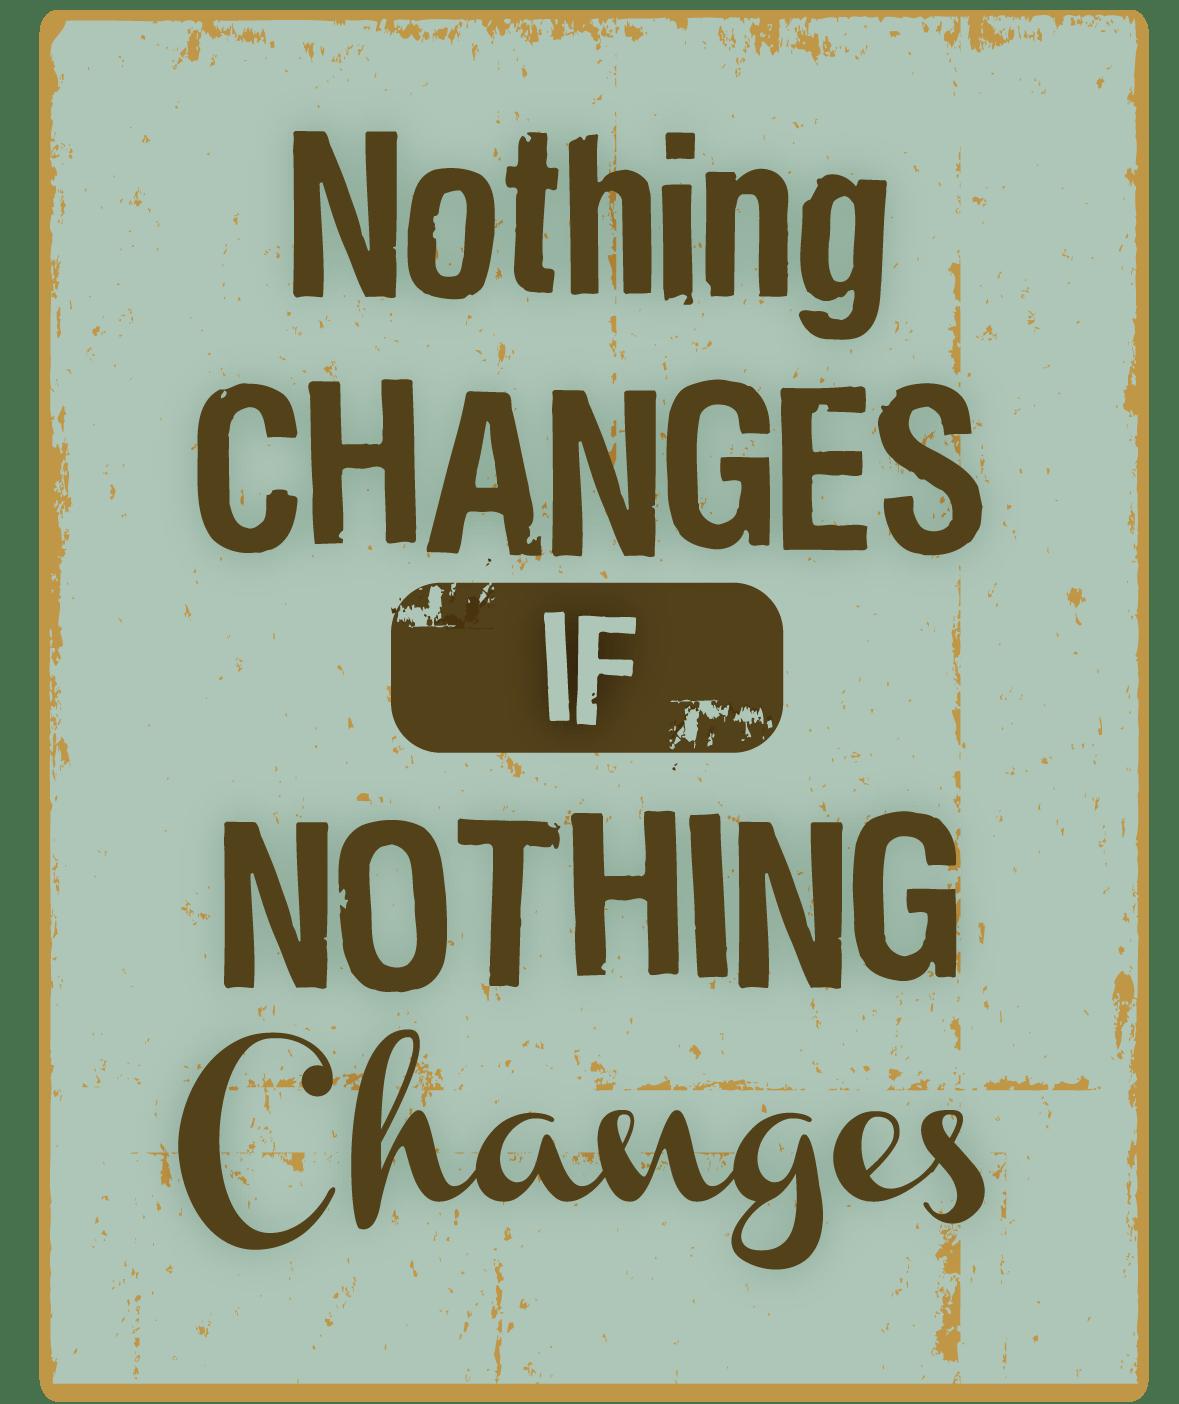 nothingchanges